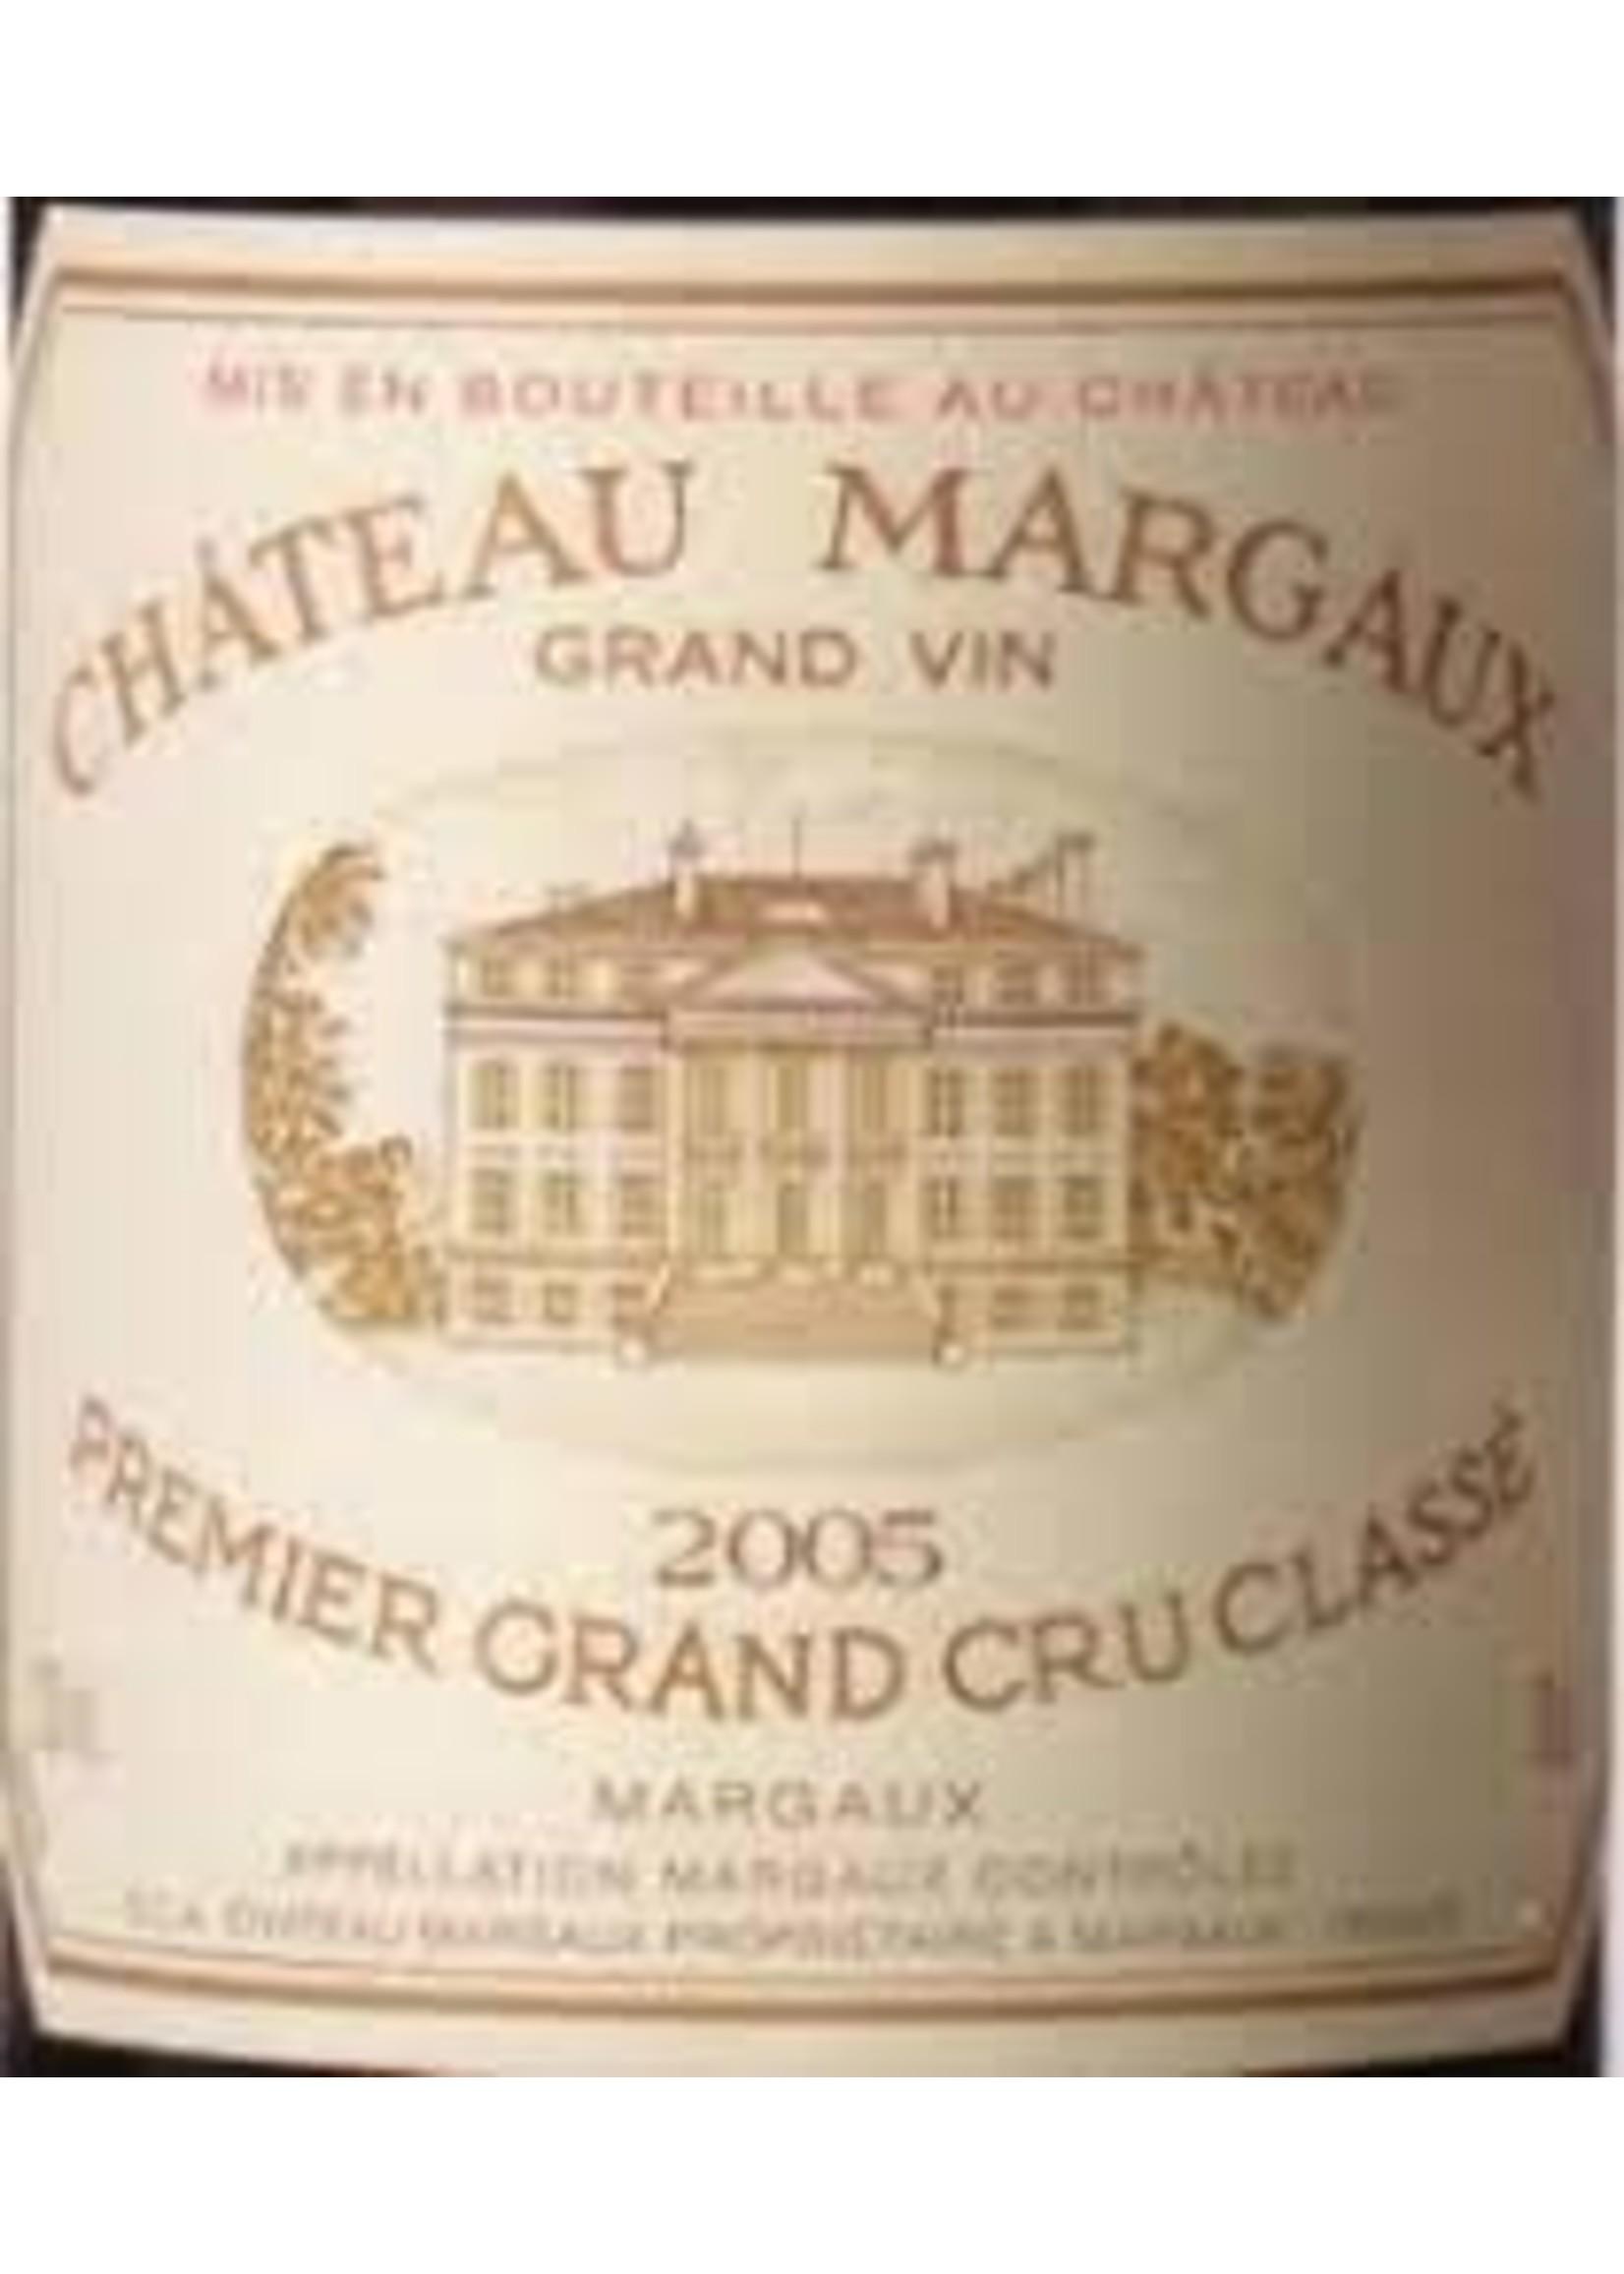 Chateau Margaux 2005 Margaux 750ml [PRE-ARRIVAL]